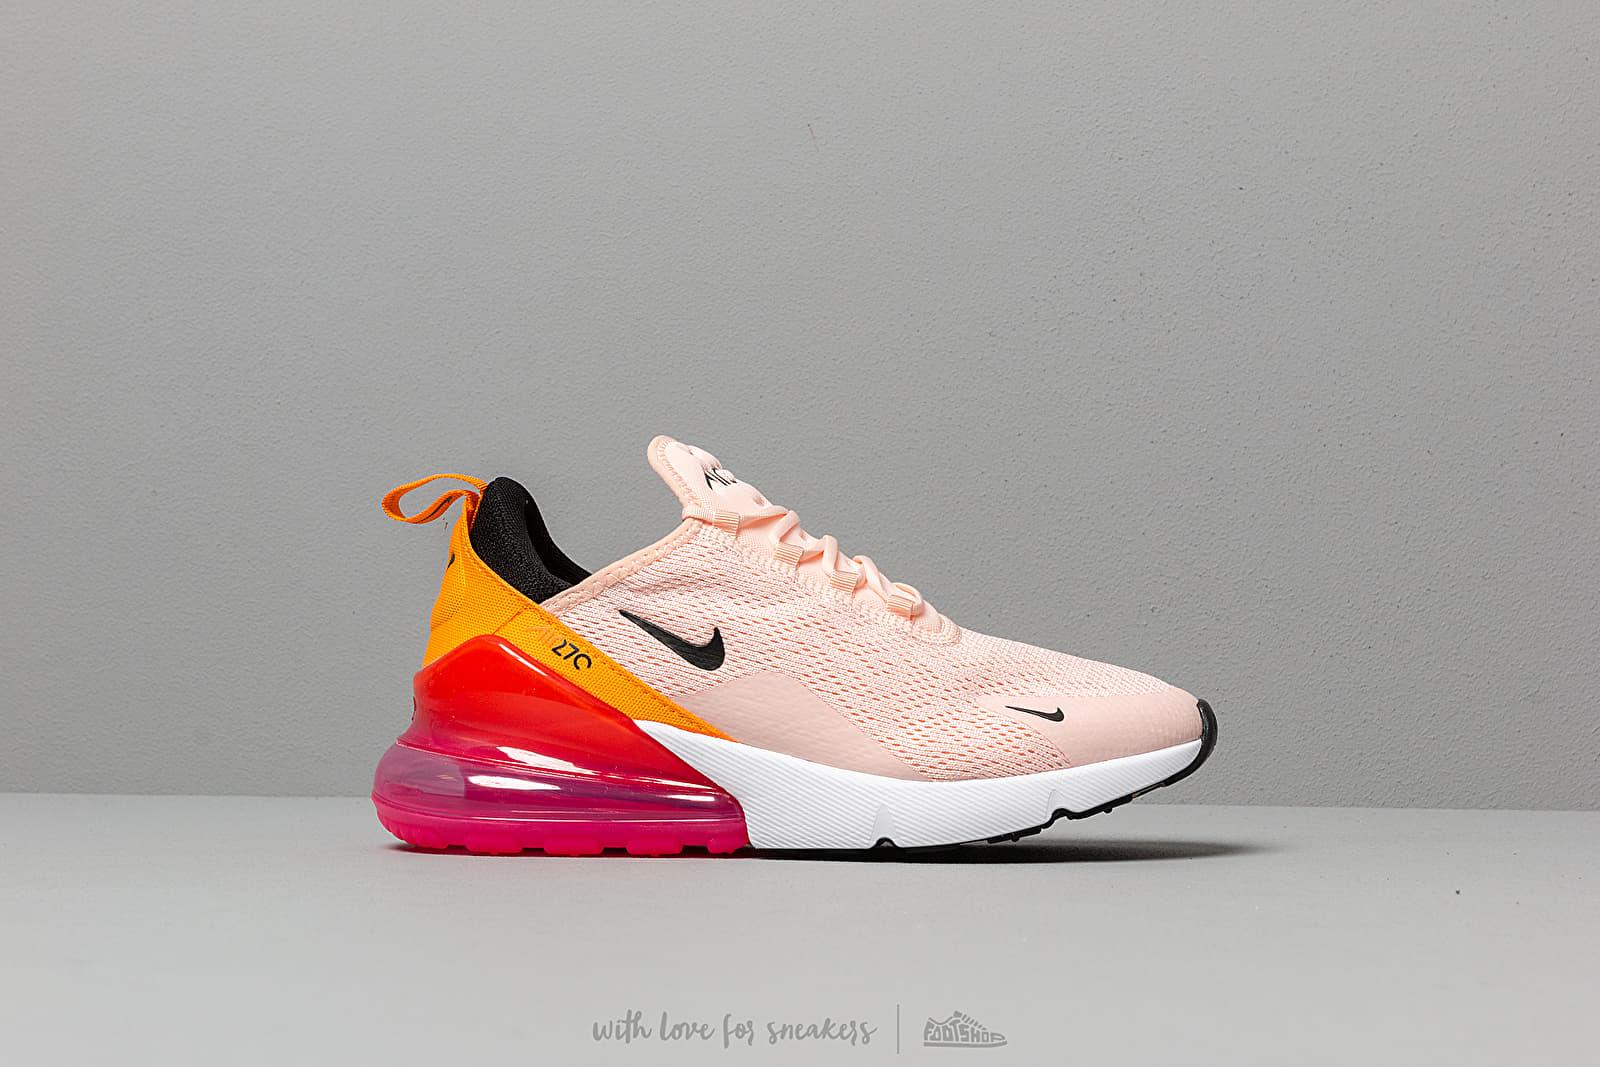 separation shoes 0f2cf 98028 Nike W Air Max 270 Washed Coral  Black-Laser Fuchsia au meilleur prix 139